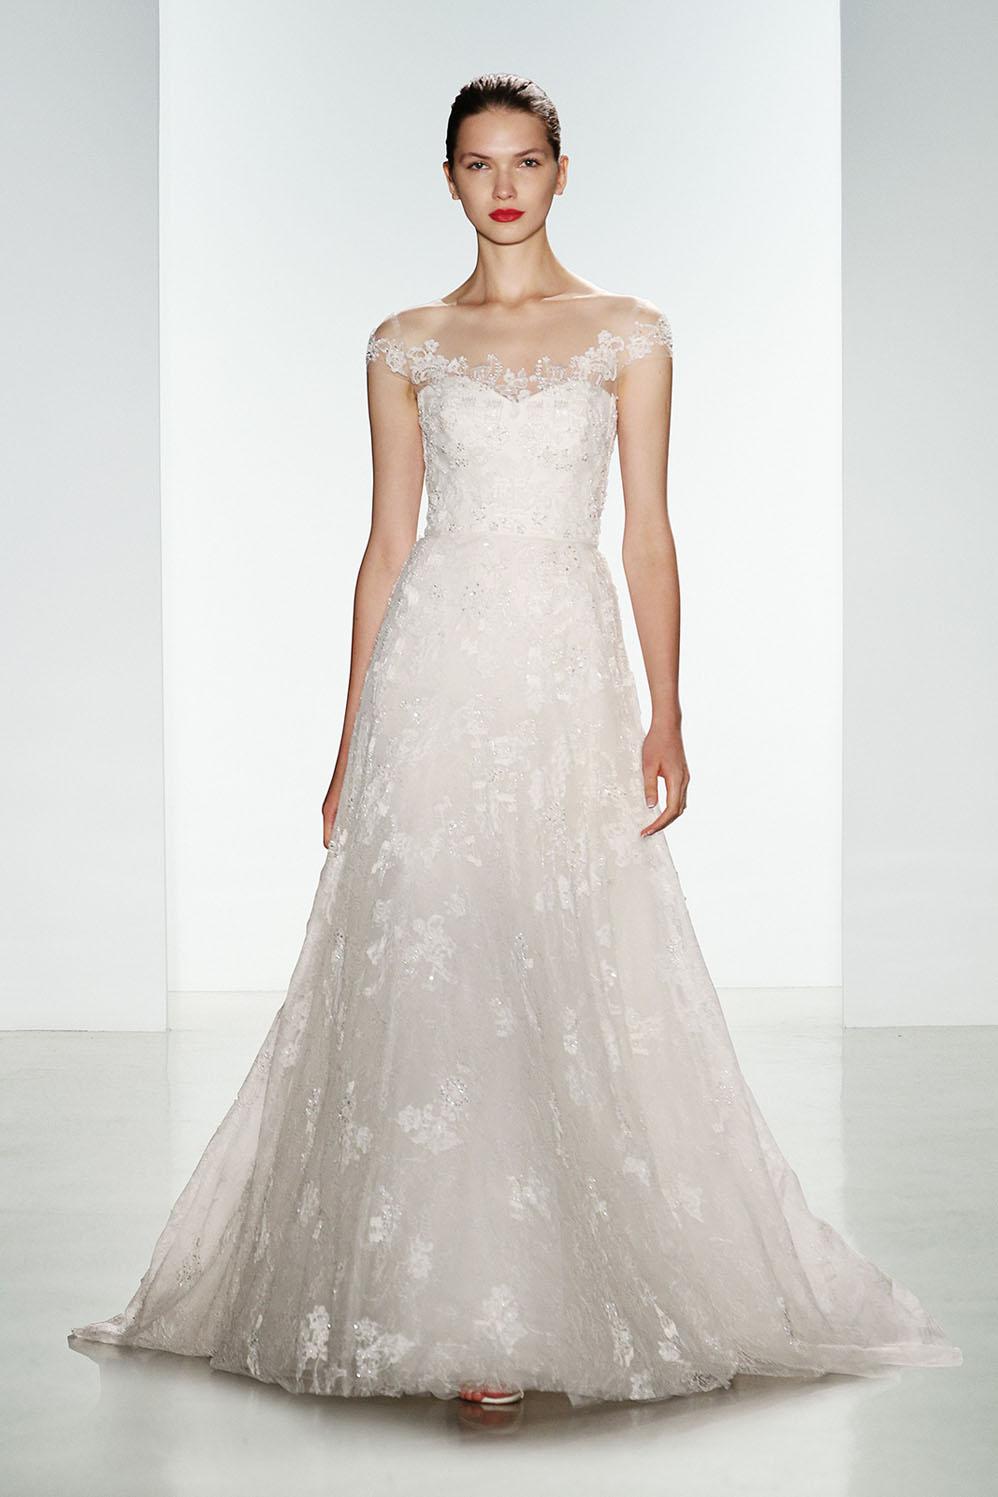 lace-fit-to-flare-wedding-dress-amsale-mari.jpg